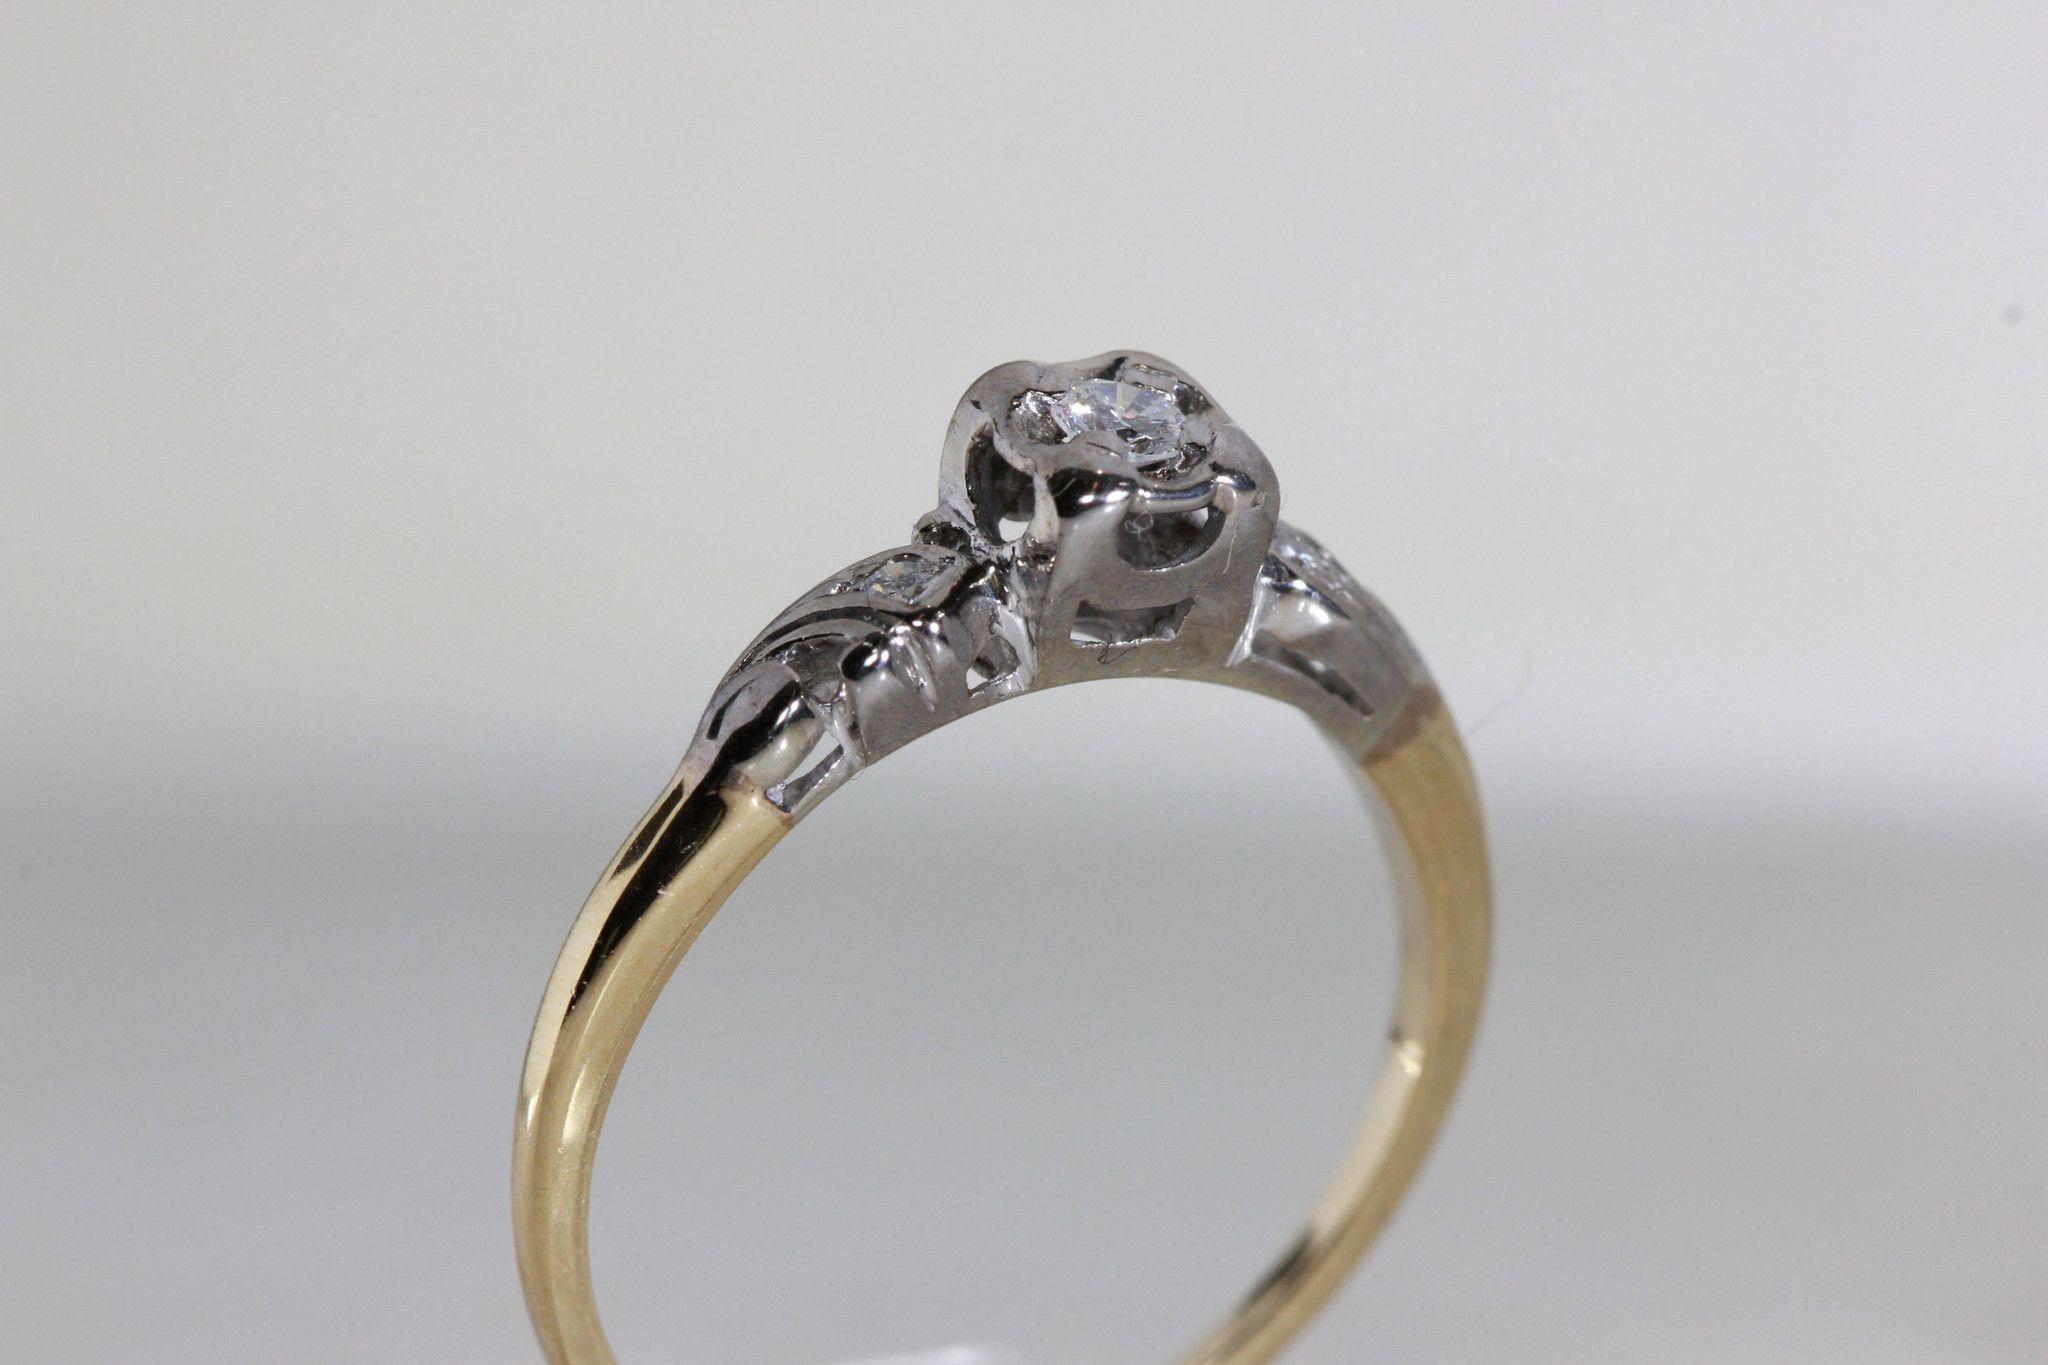 Antique 1940 S Vintage Engagement Ring 14k White Yellow Gold Diamond Ring Illusion Setting Vintage Engagement Rings Pink Tourmaline Engagement Ring Yellow Gold Diamond Ring